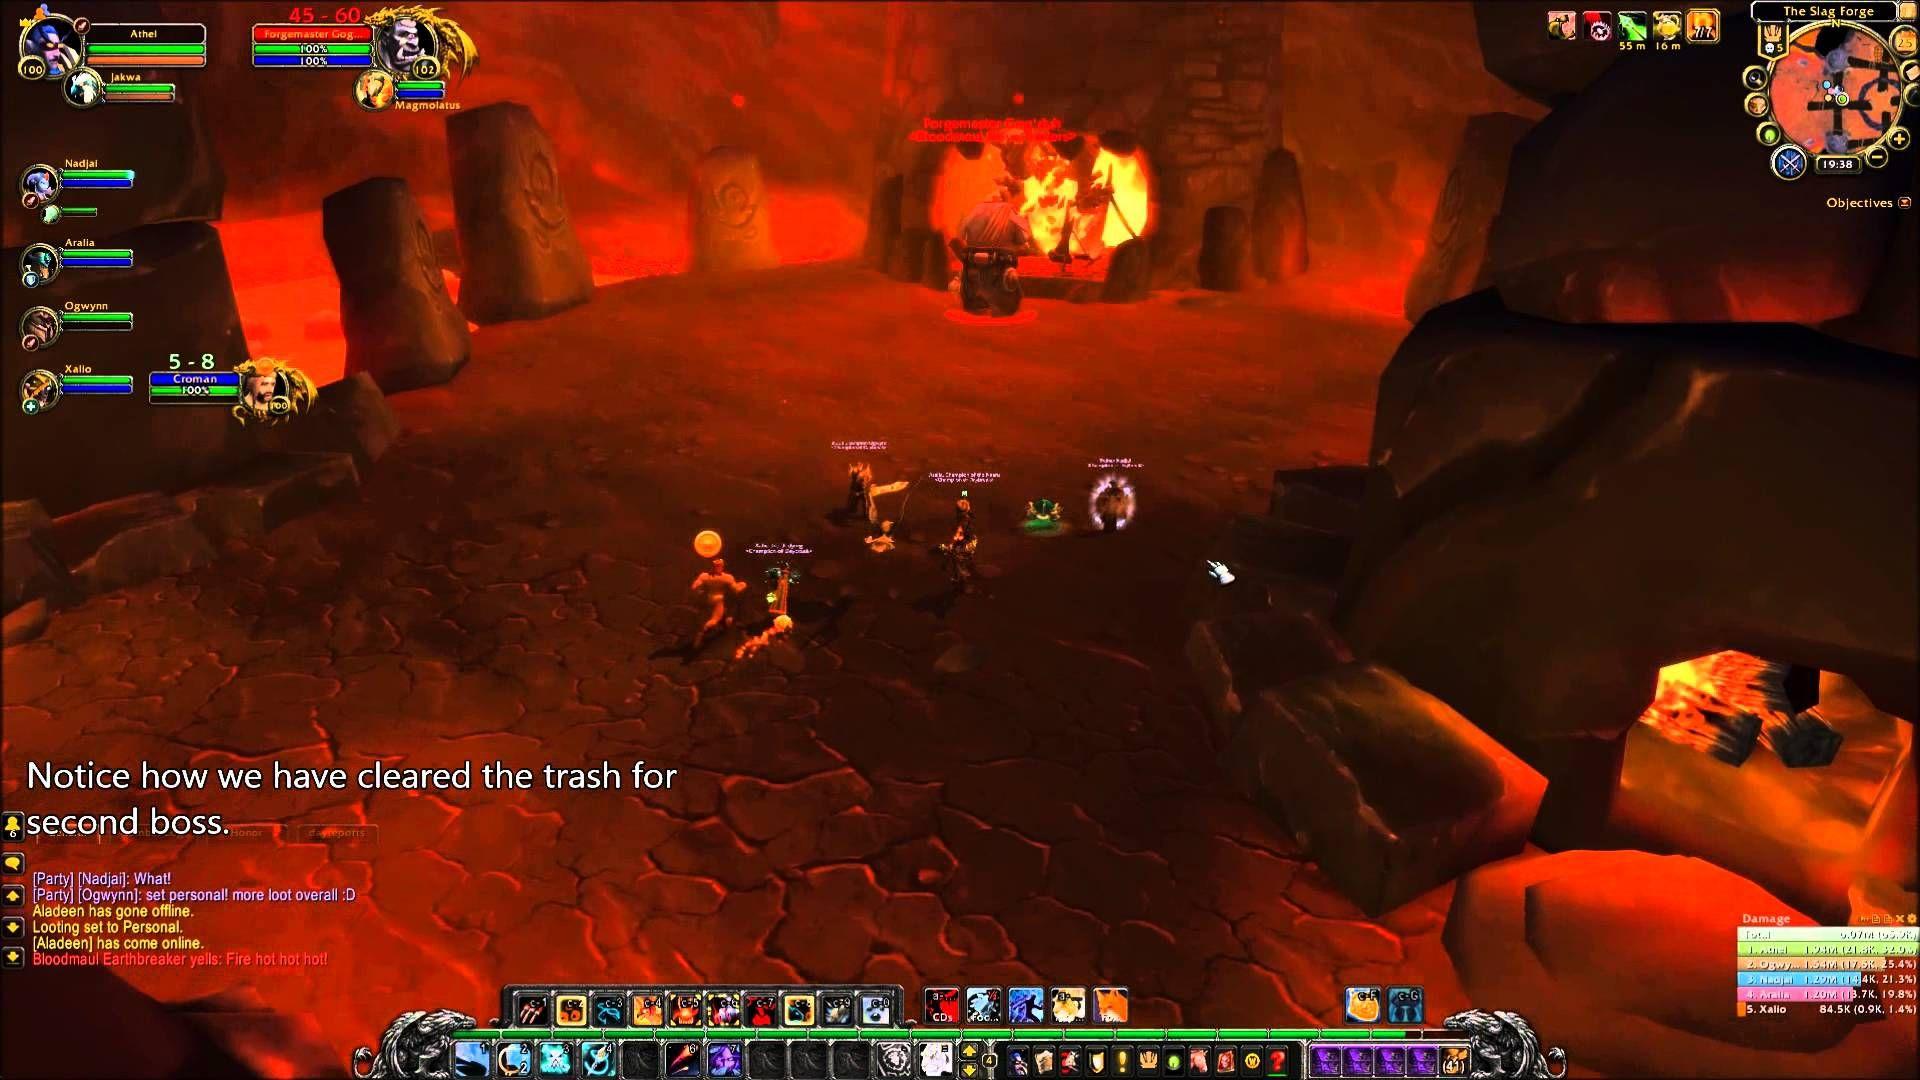 nice Glory of the Draenor Hero Guide - Bloodmaul Slag Mines